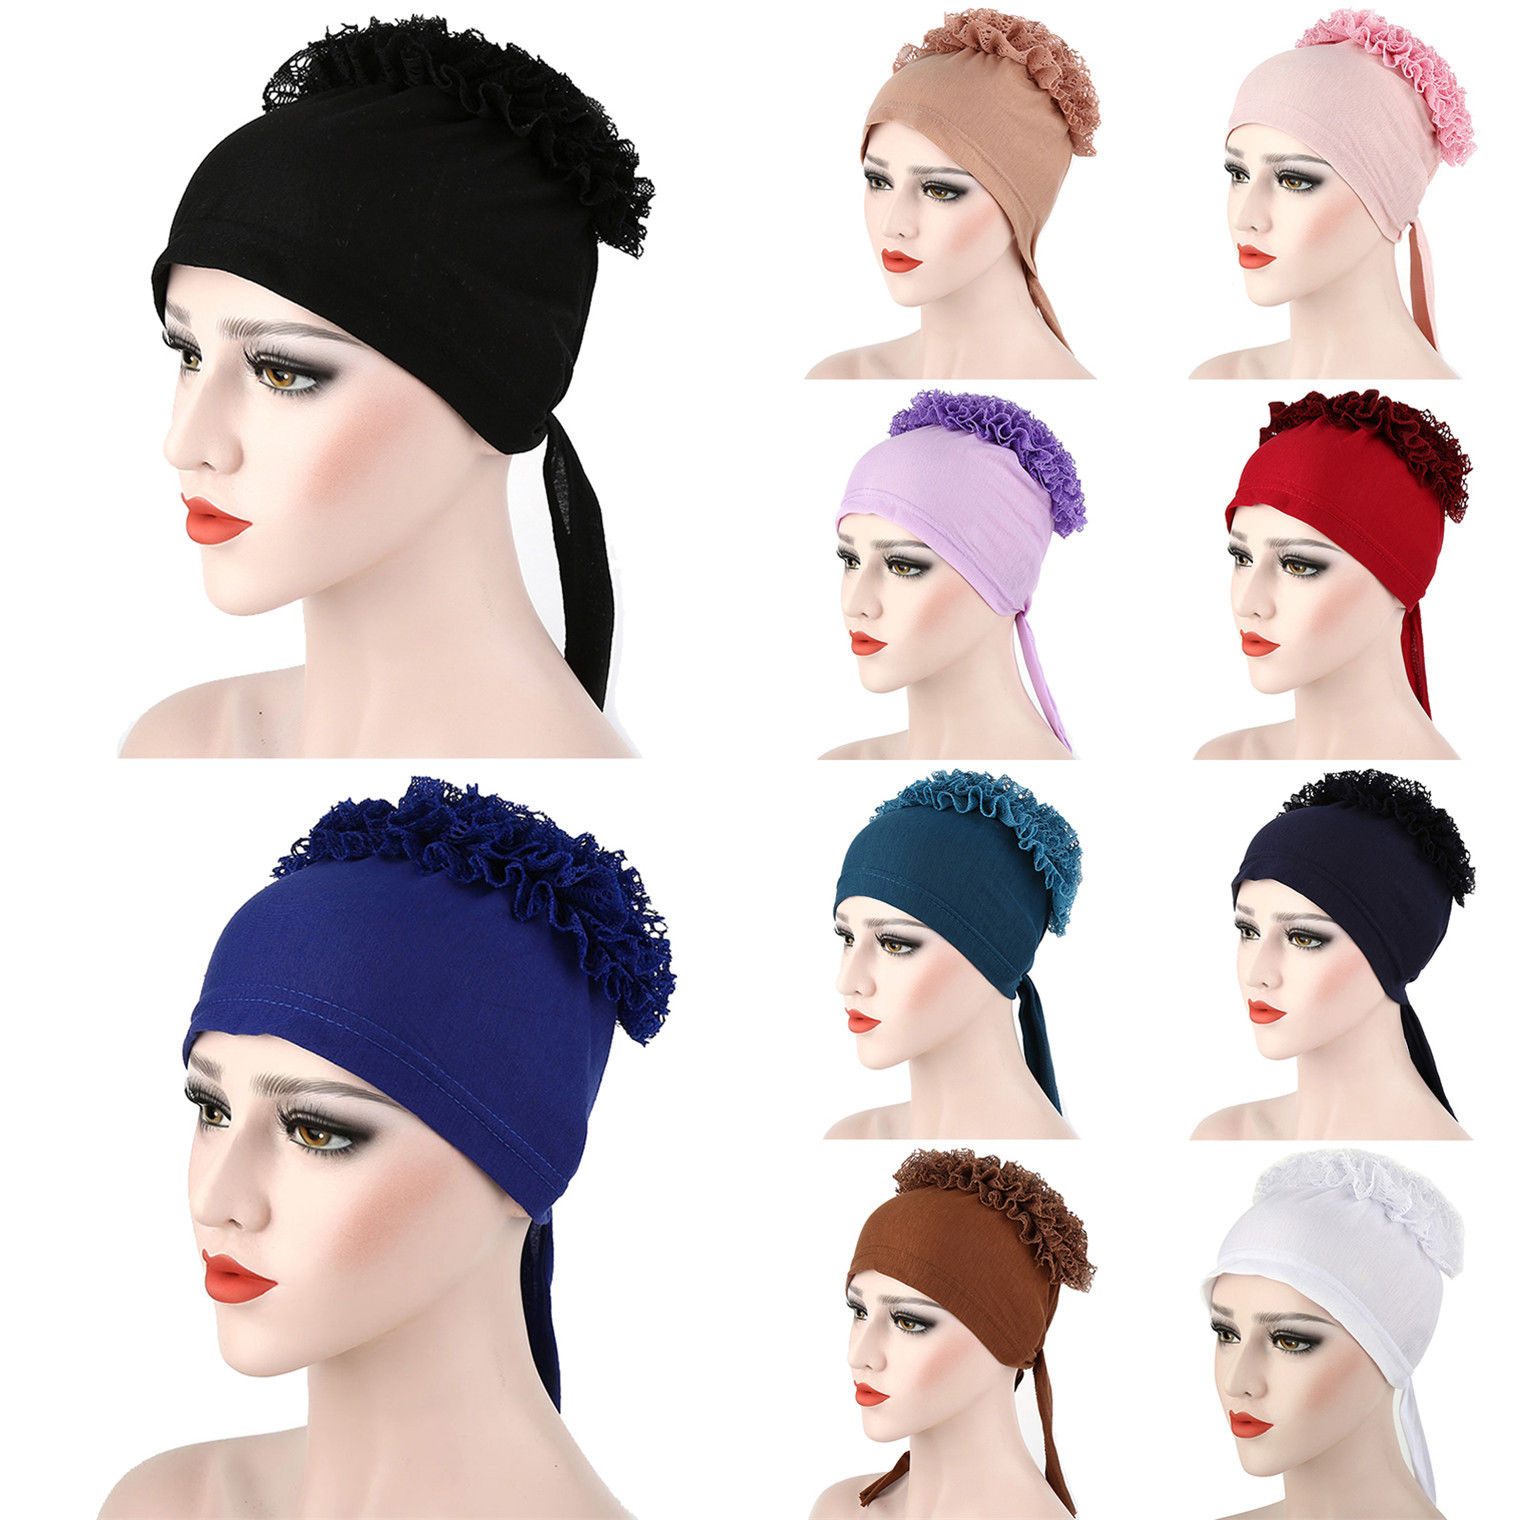 Stylish Under Scarf Plain LACE BONNET Tube Cap Turban Hat for Hijab Head Scarf